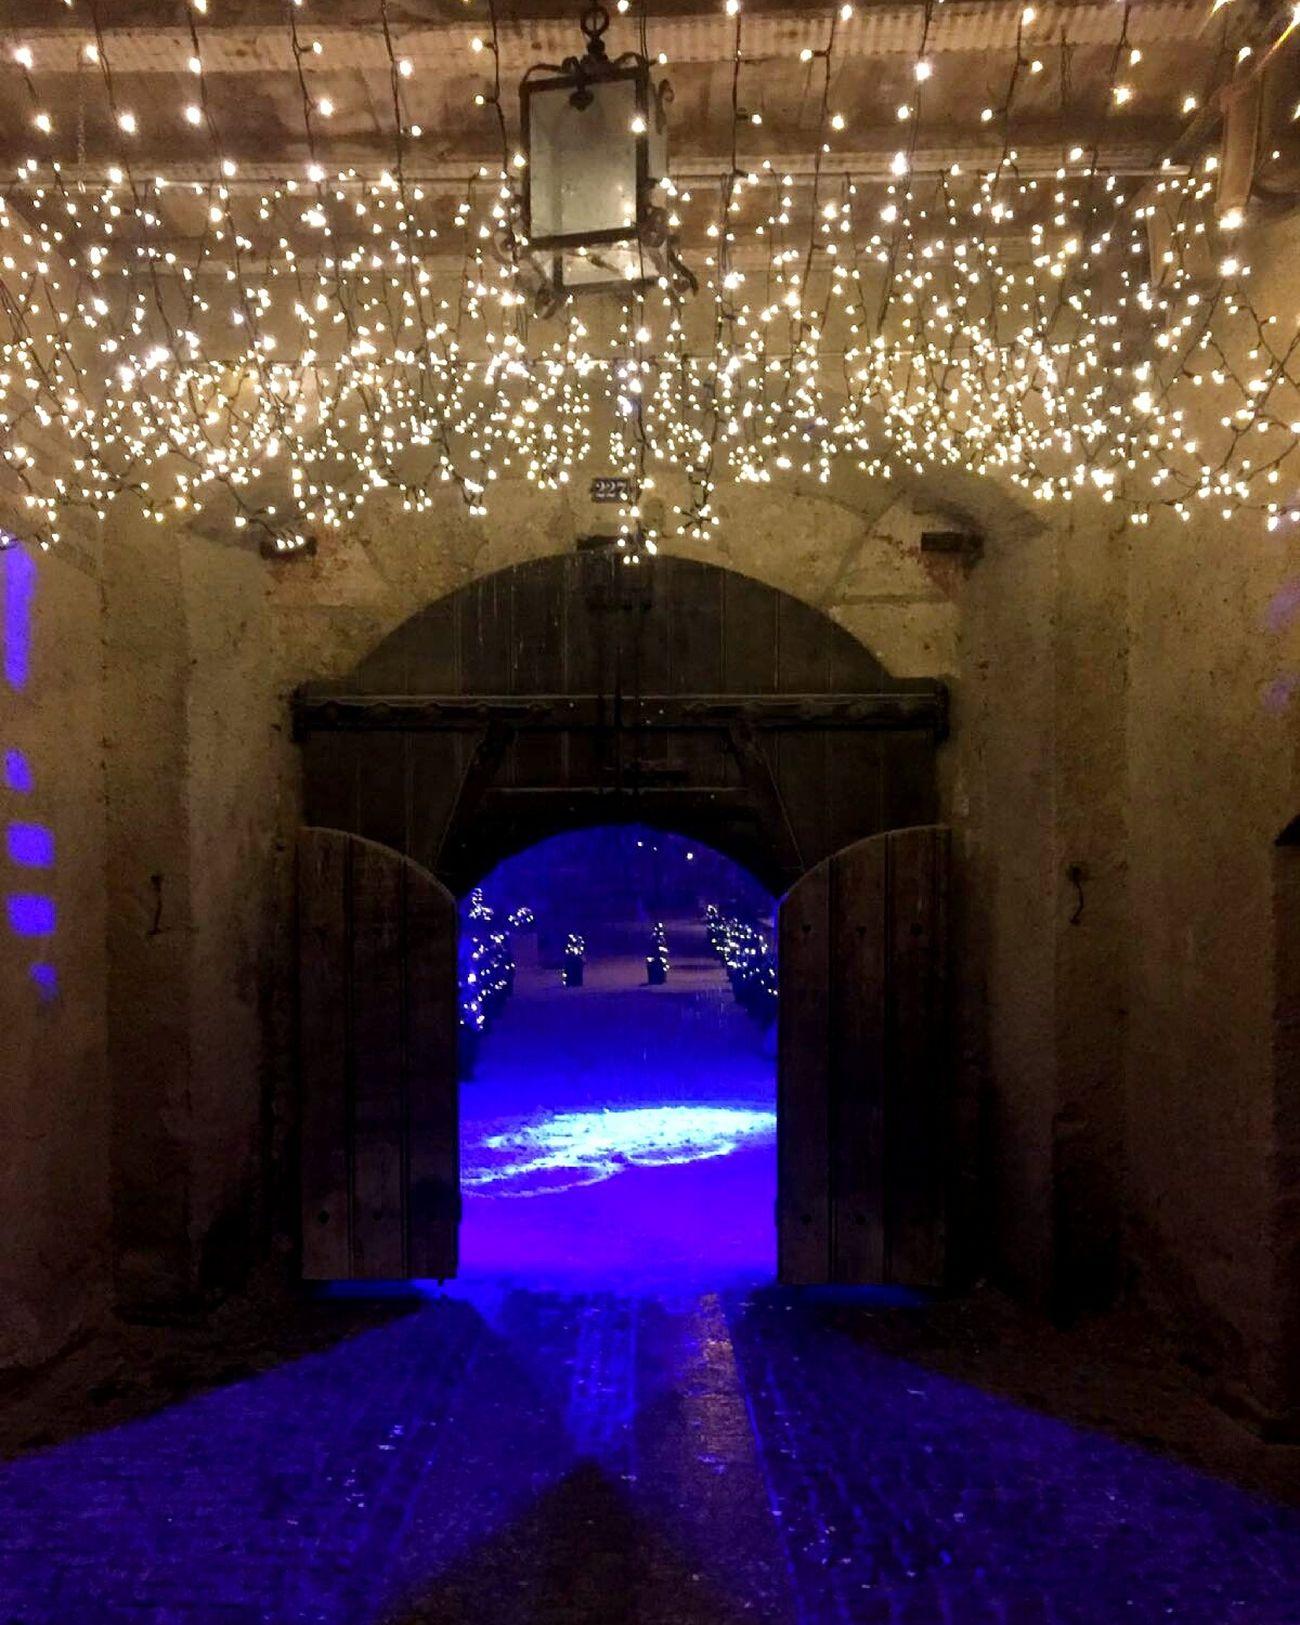 Rheinfall Door Light Schnee Beleuchtung Bambekosfotografia Blau Switzerland Traveling Home For The Holidays Europa.Photos.Collection.Eyeem© Rheinfall Schaffhausen/Schweiz